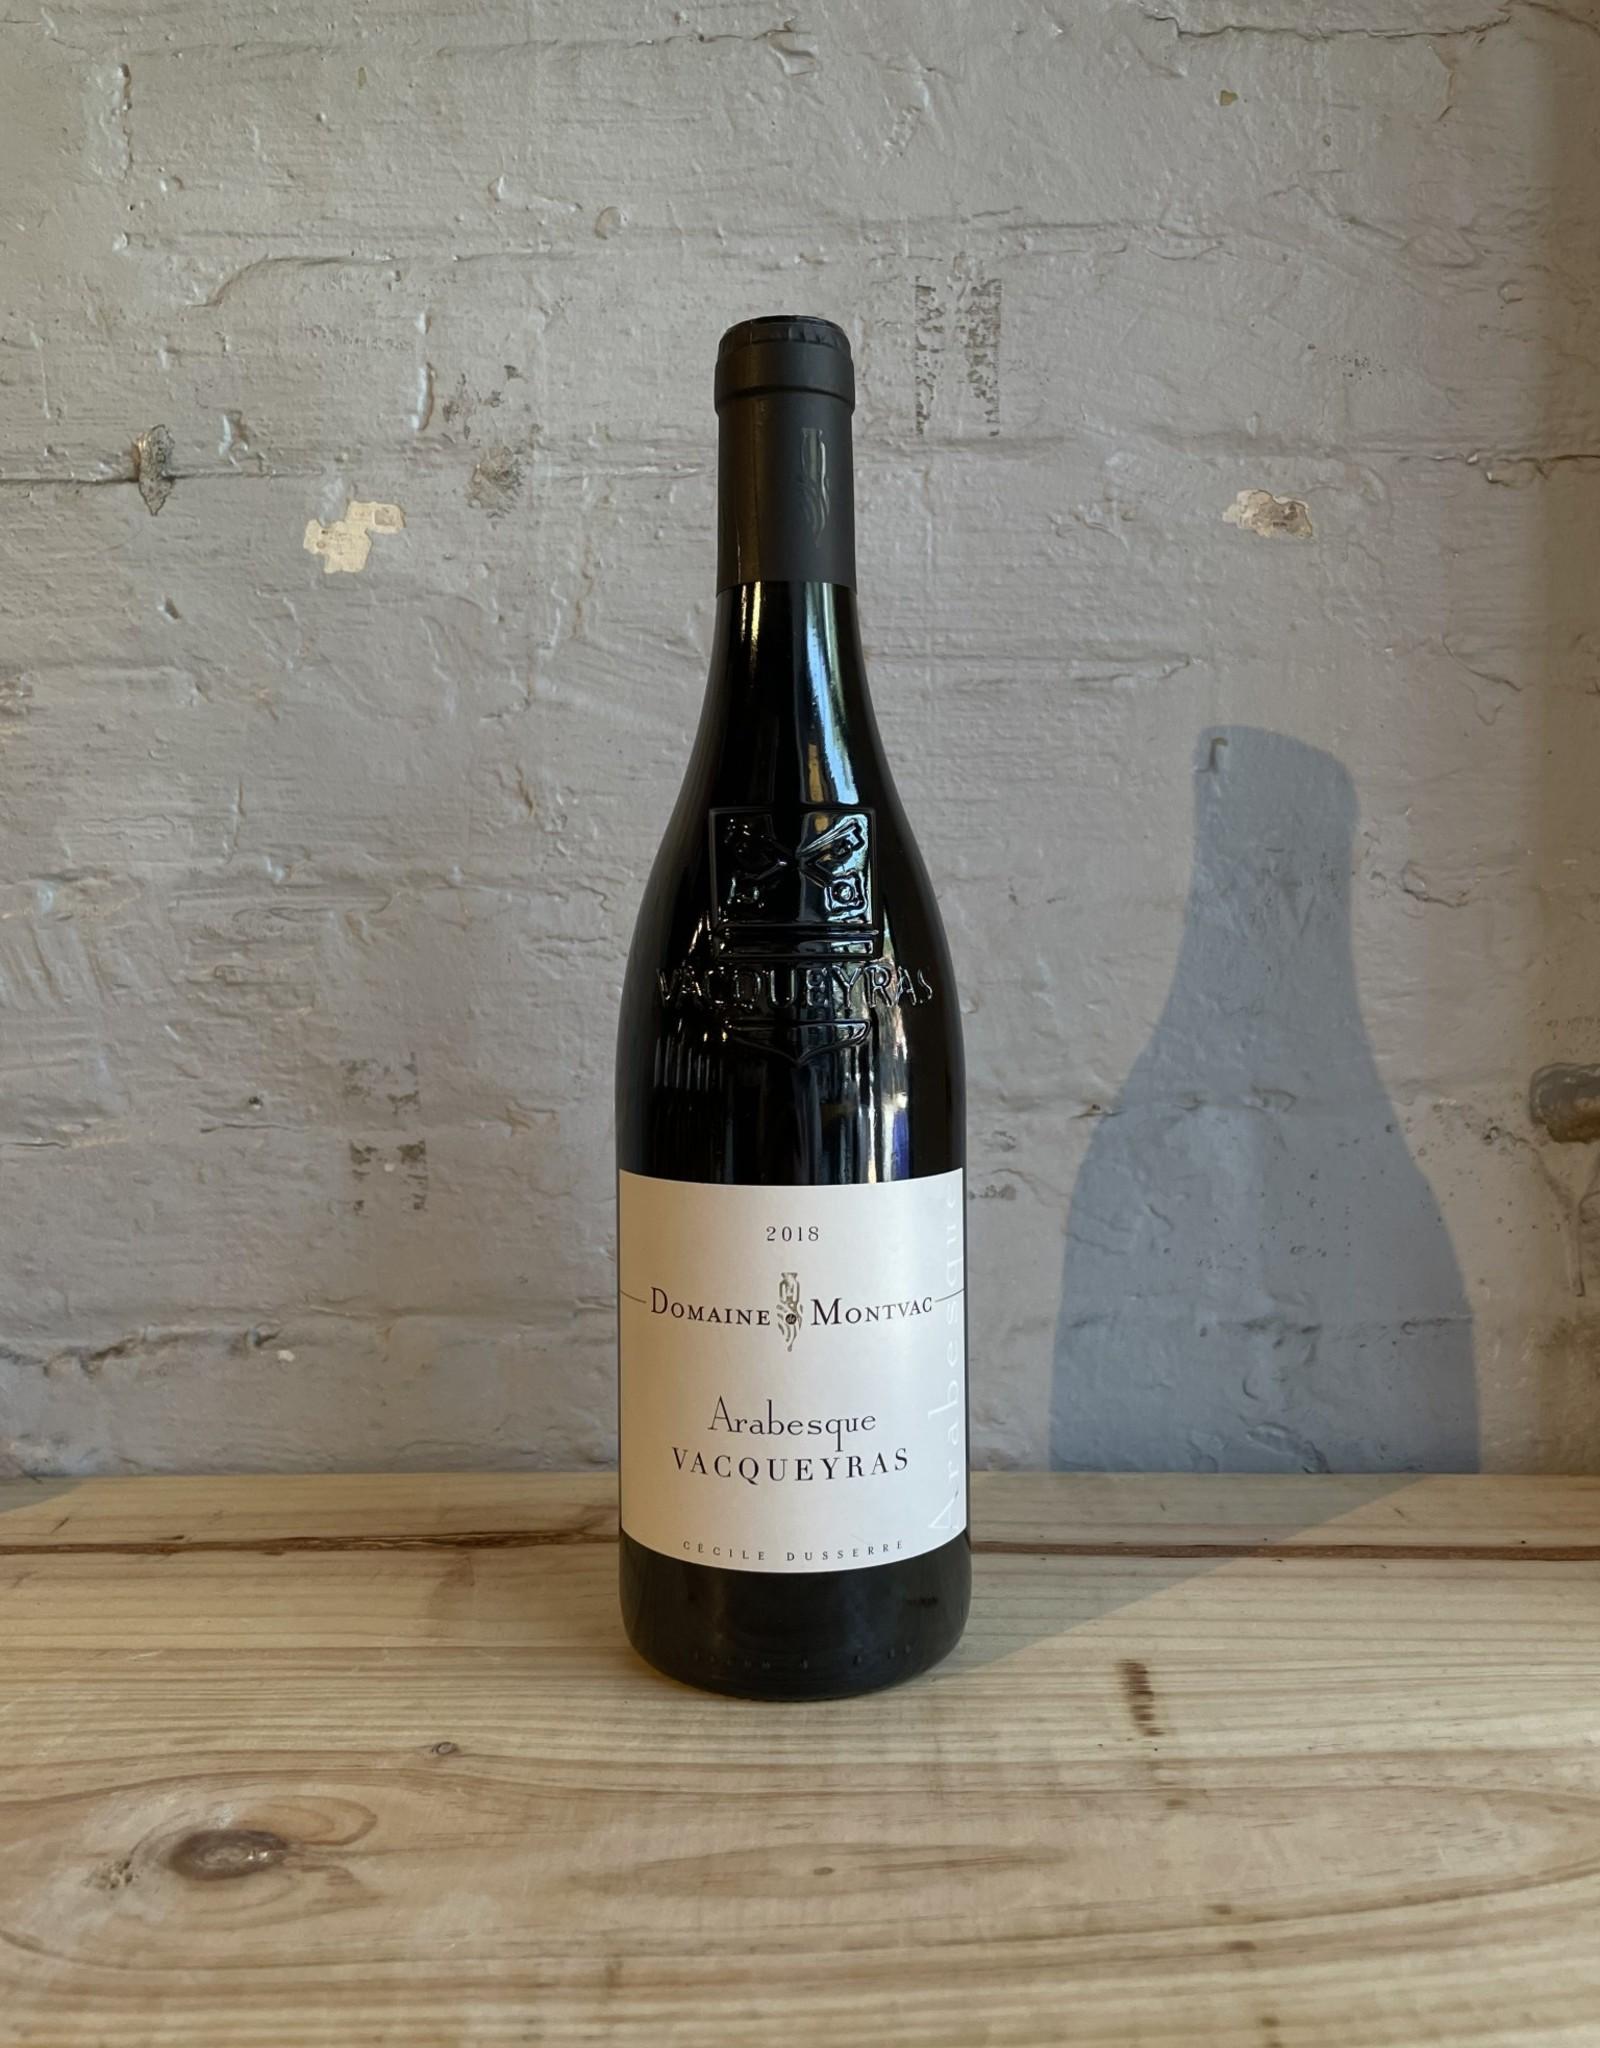 Wine 2018 Domaine de Montvac Arabesque - Vacqueyras, Rhone Valley, France (750ml)